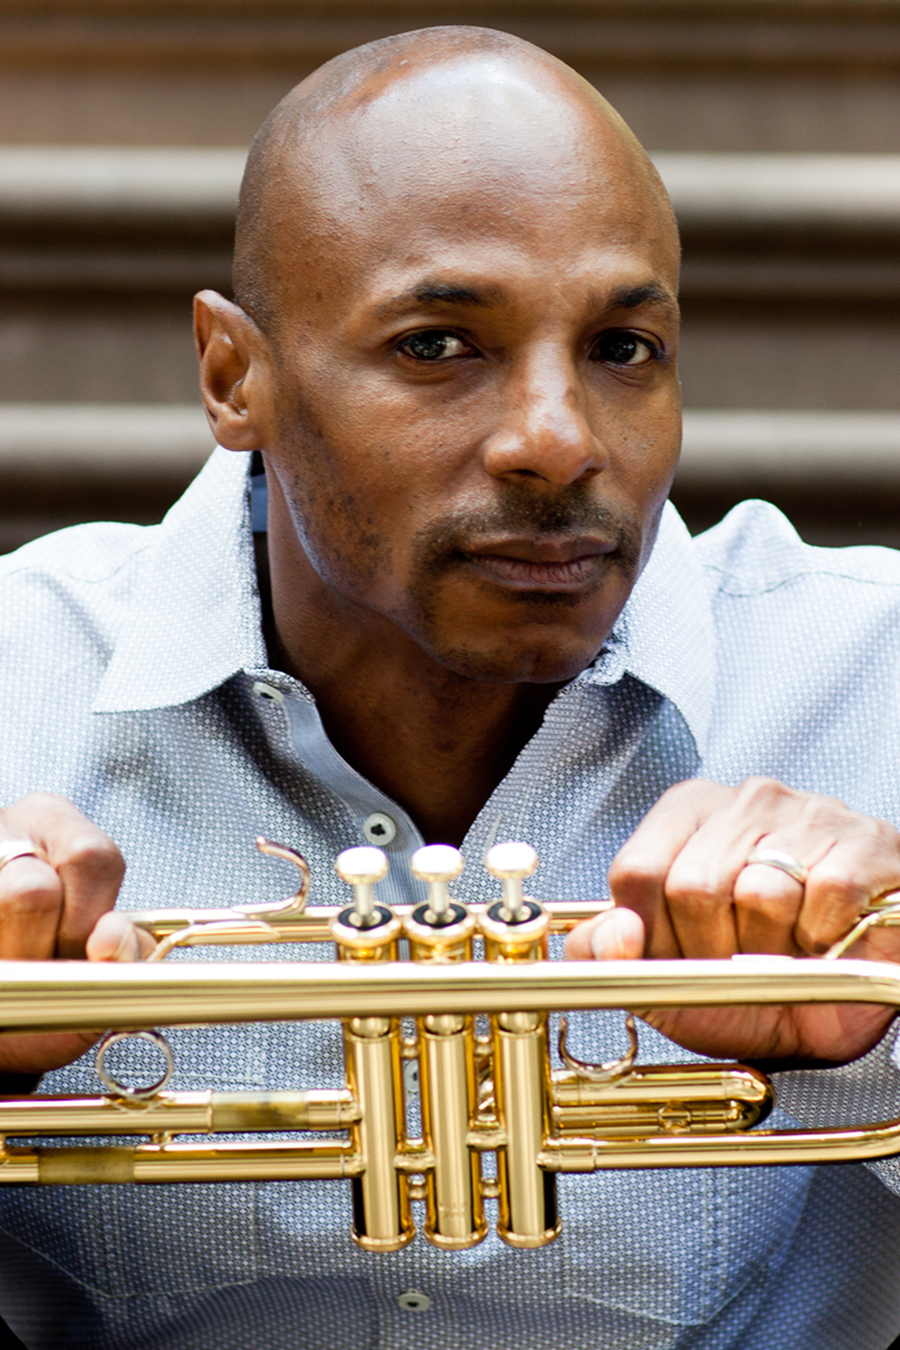 Duane Eubanks, trumpet